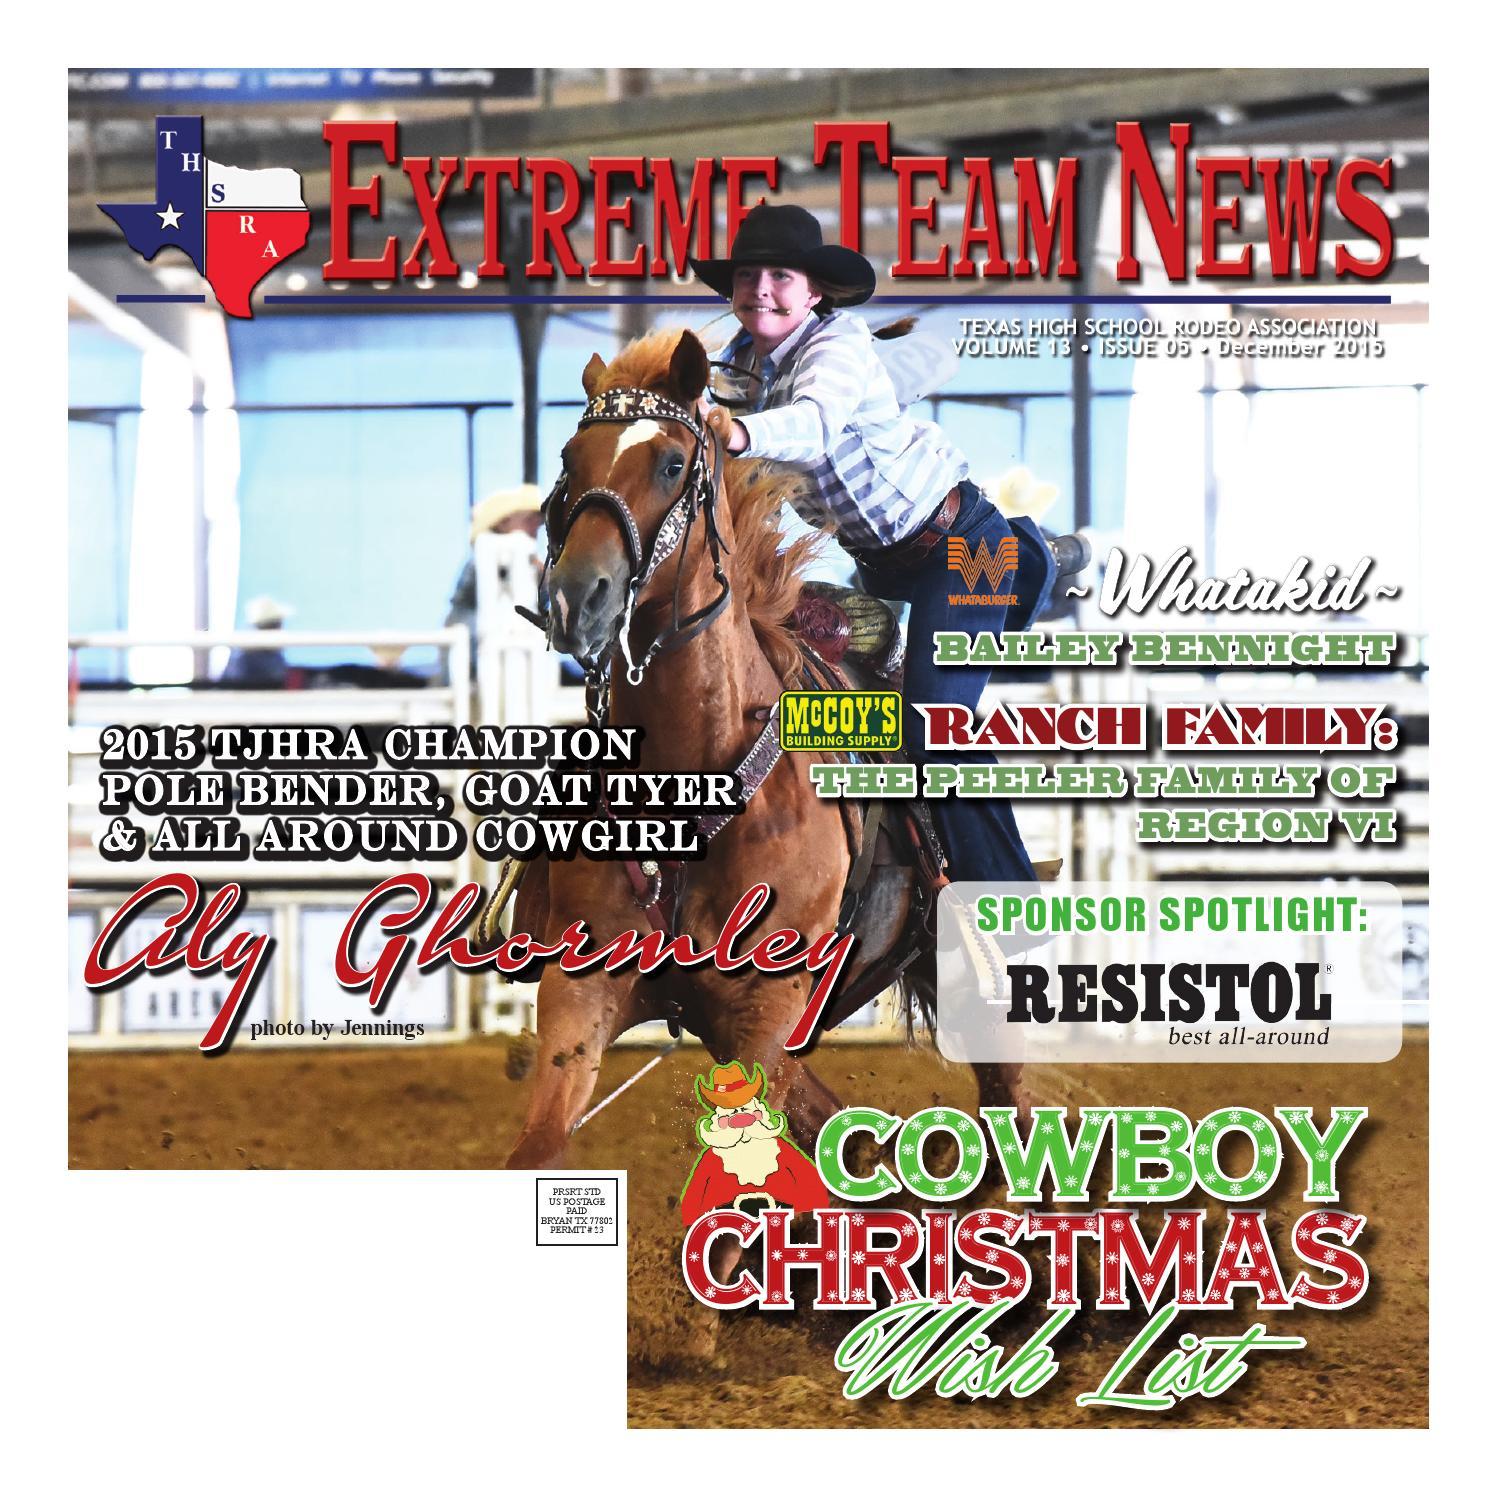 December 2015 Extreme Team News Official News Of Texas